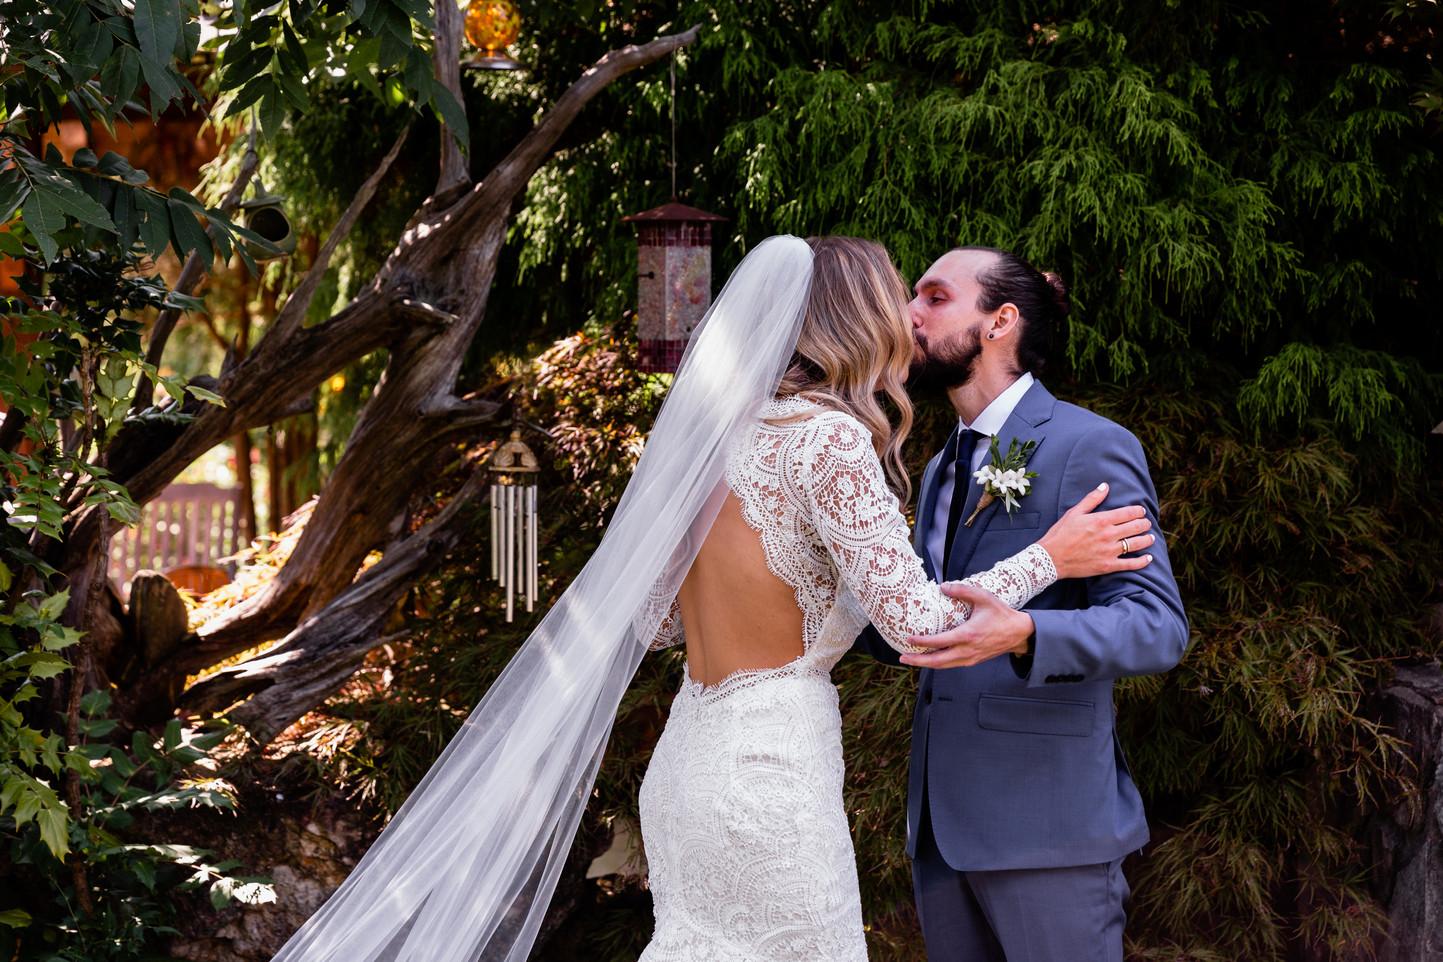 Arlen-Katelyn-Wedding-258.jpg